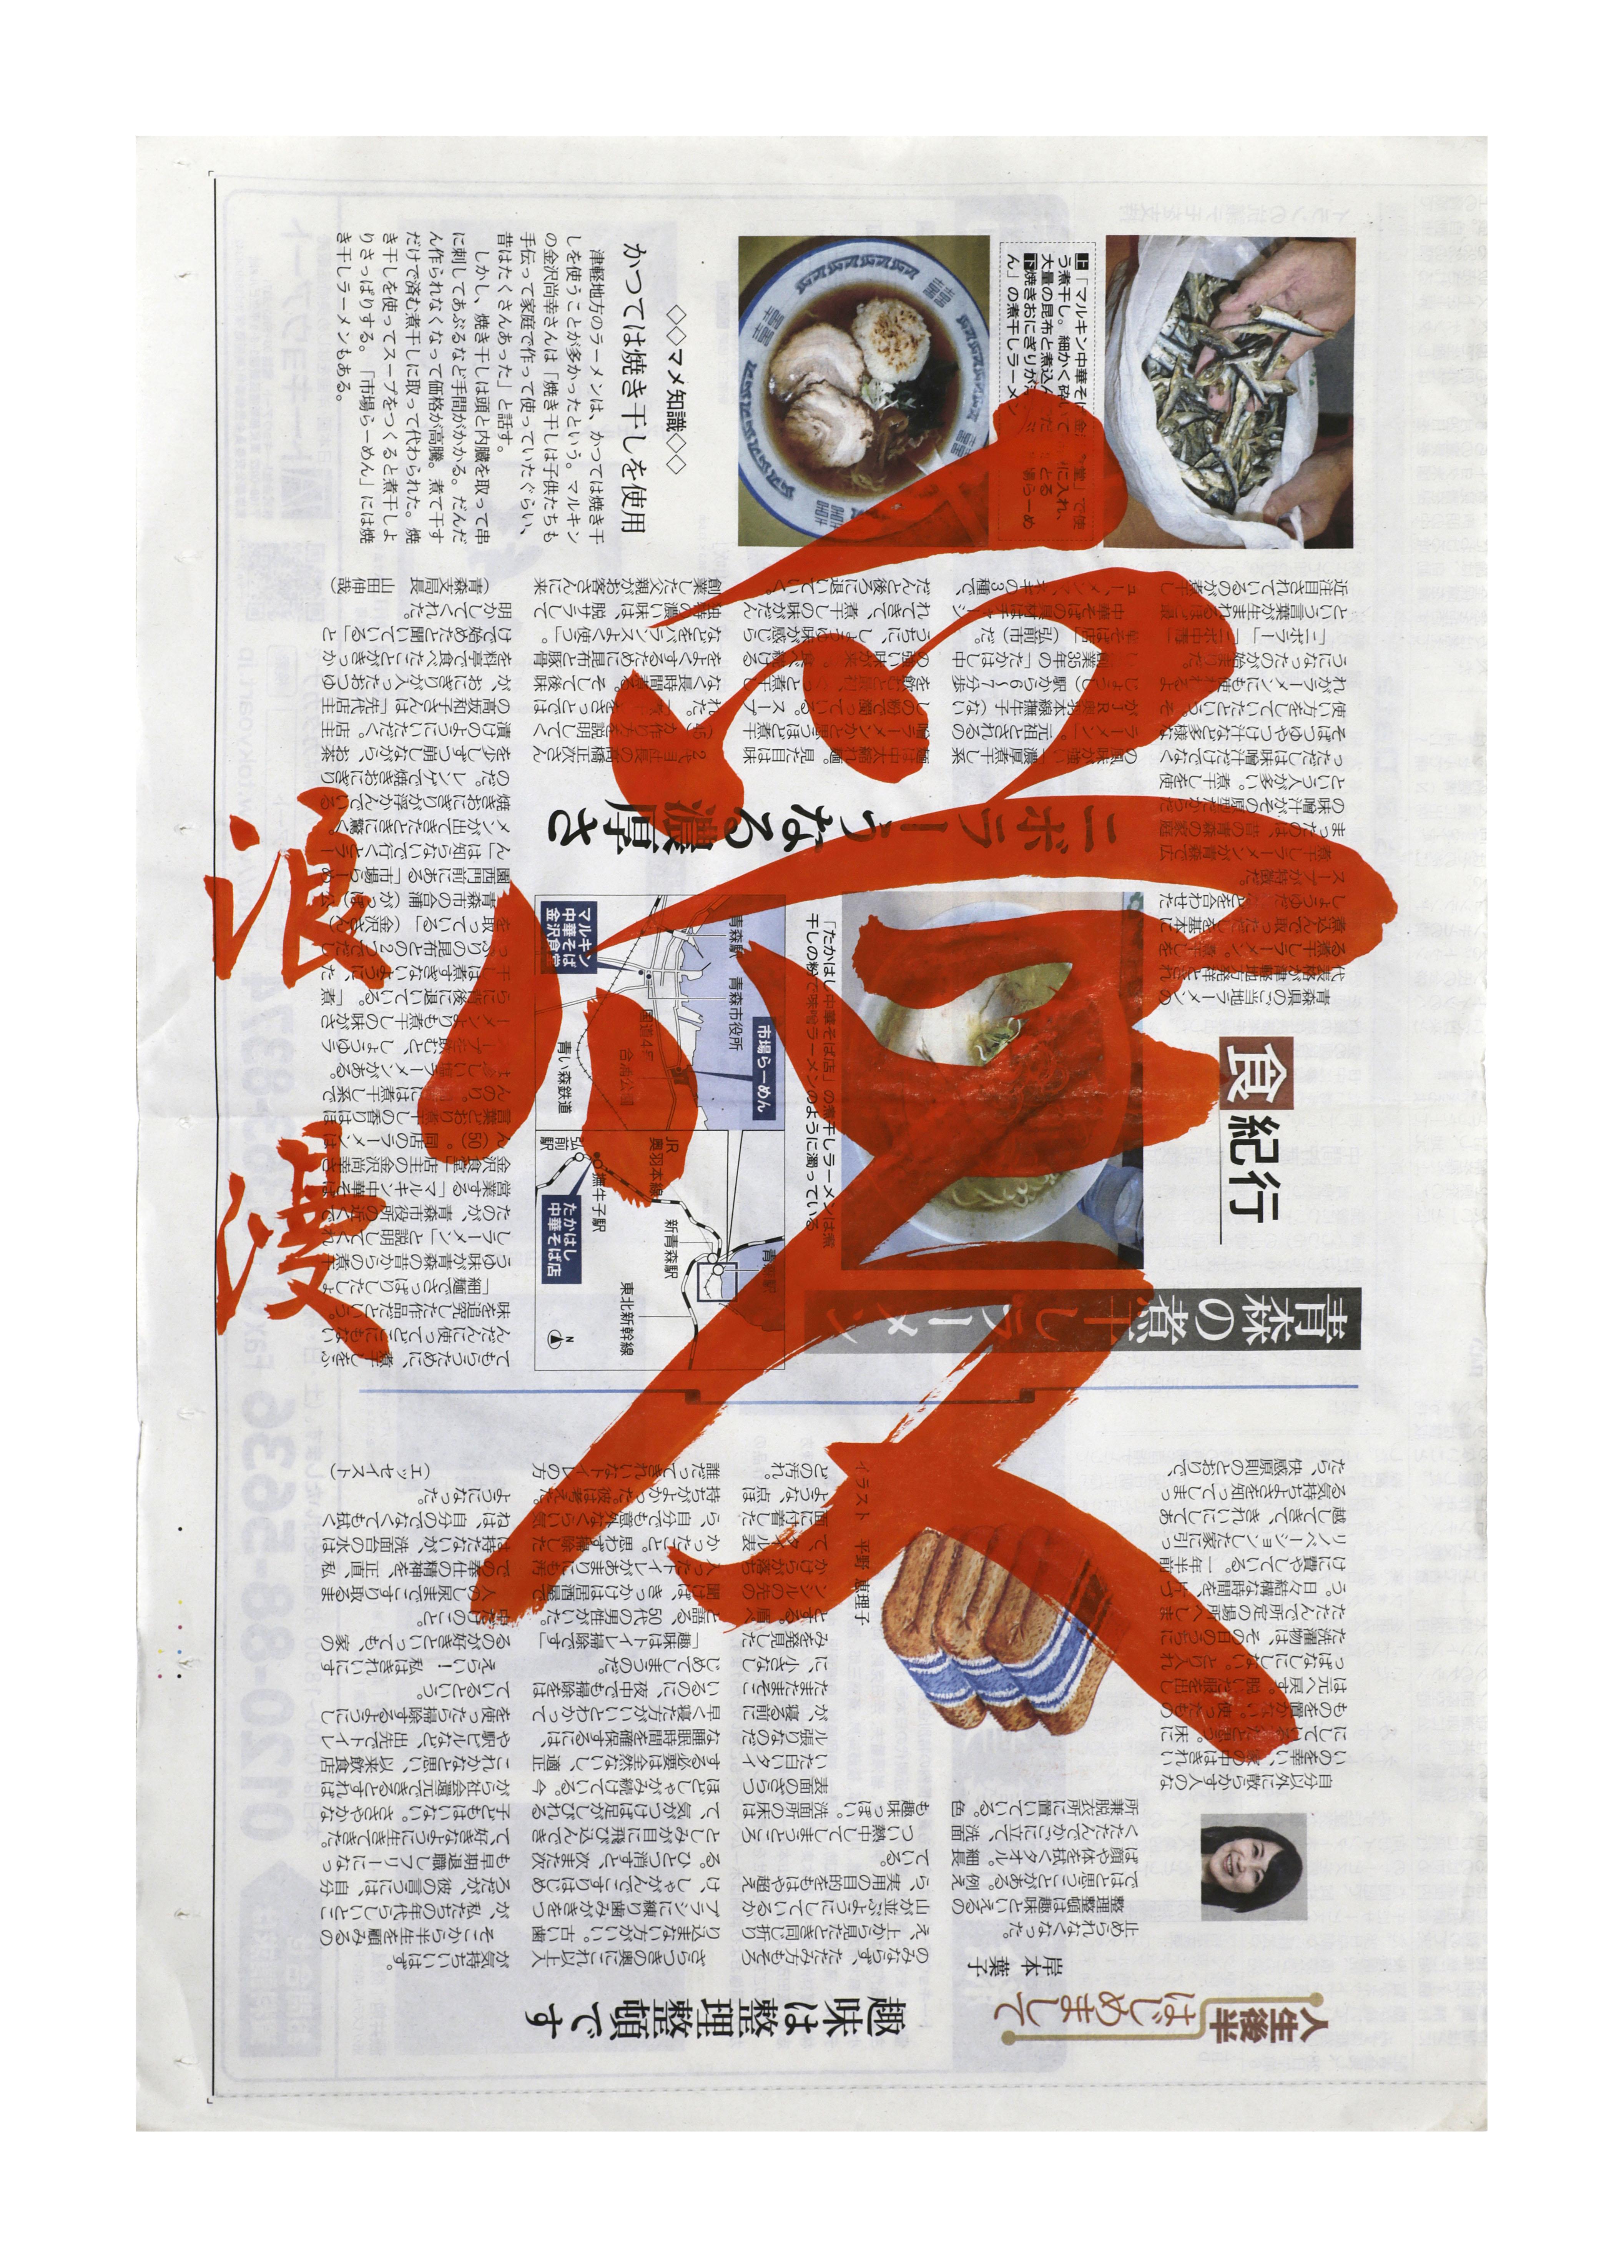 愛 - Amour (modèle sur journal)